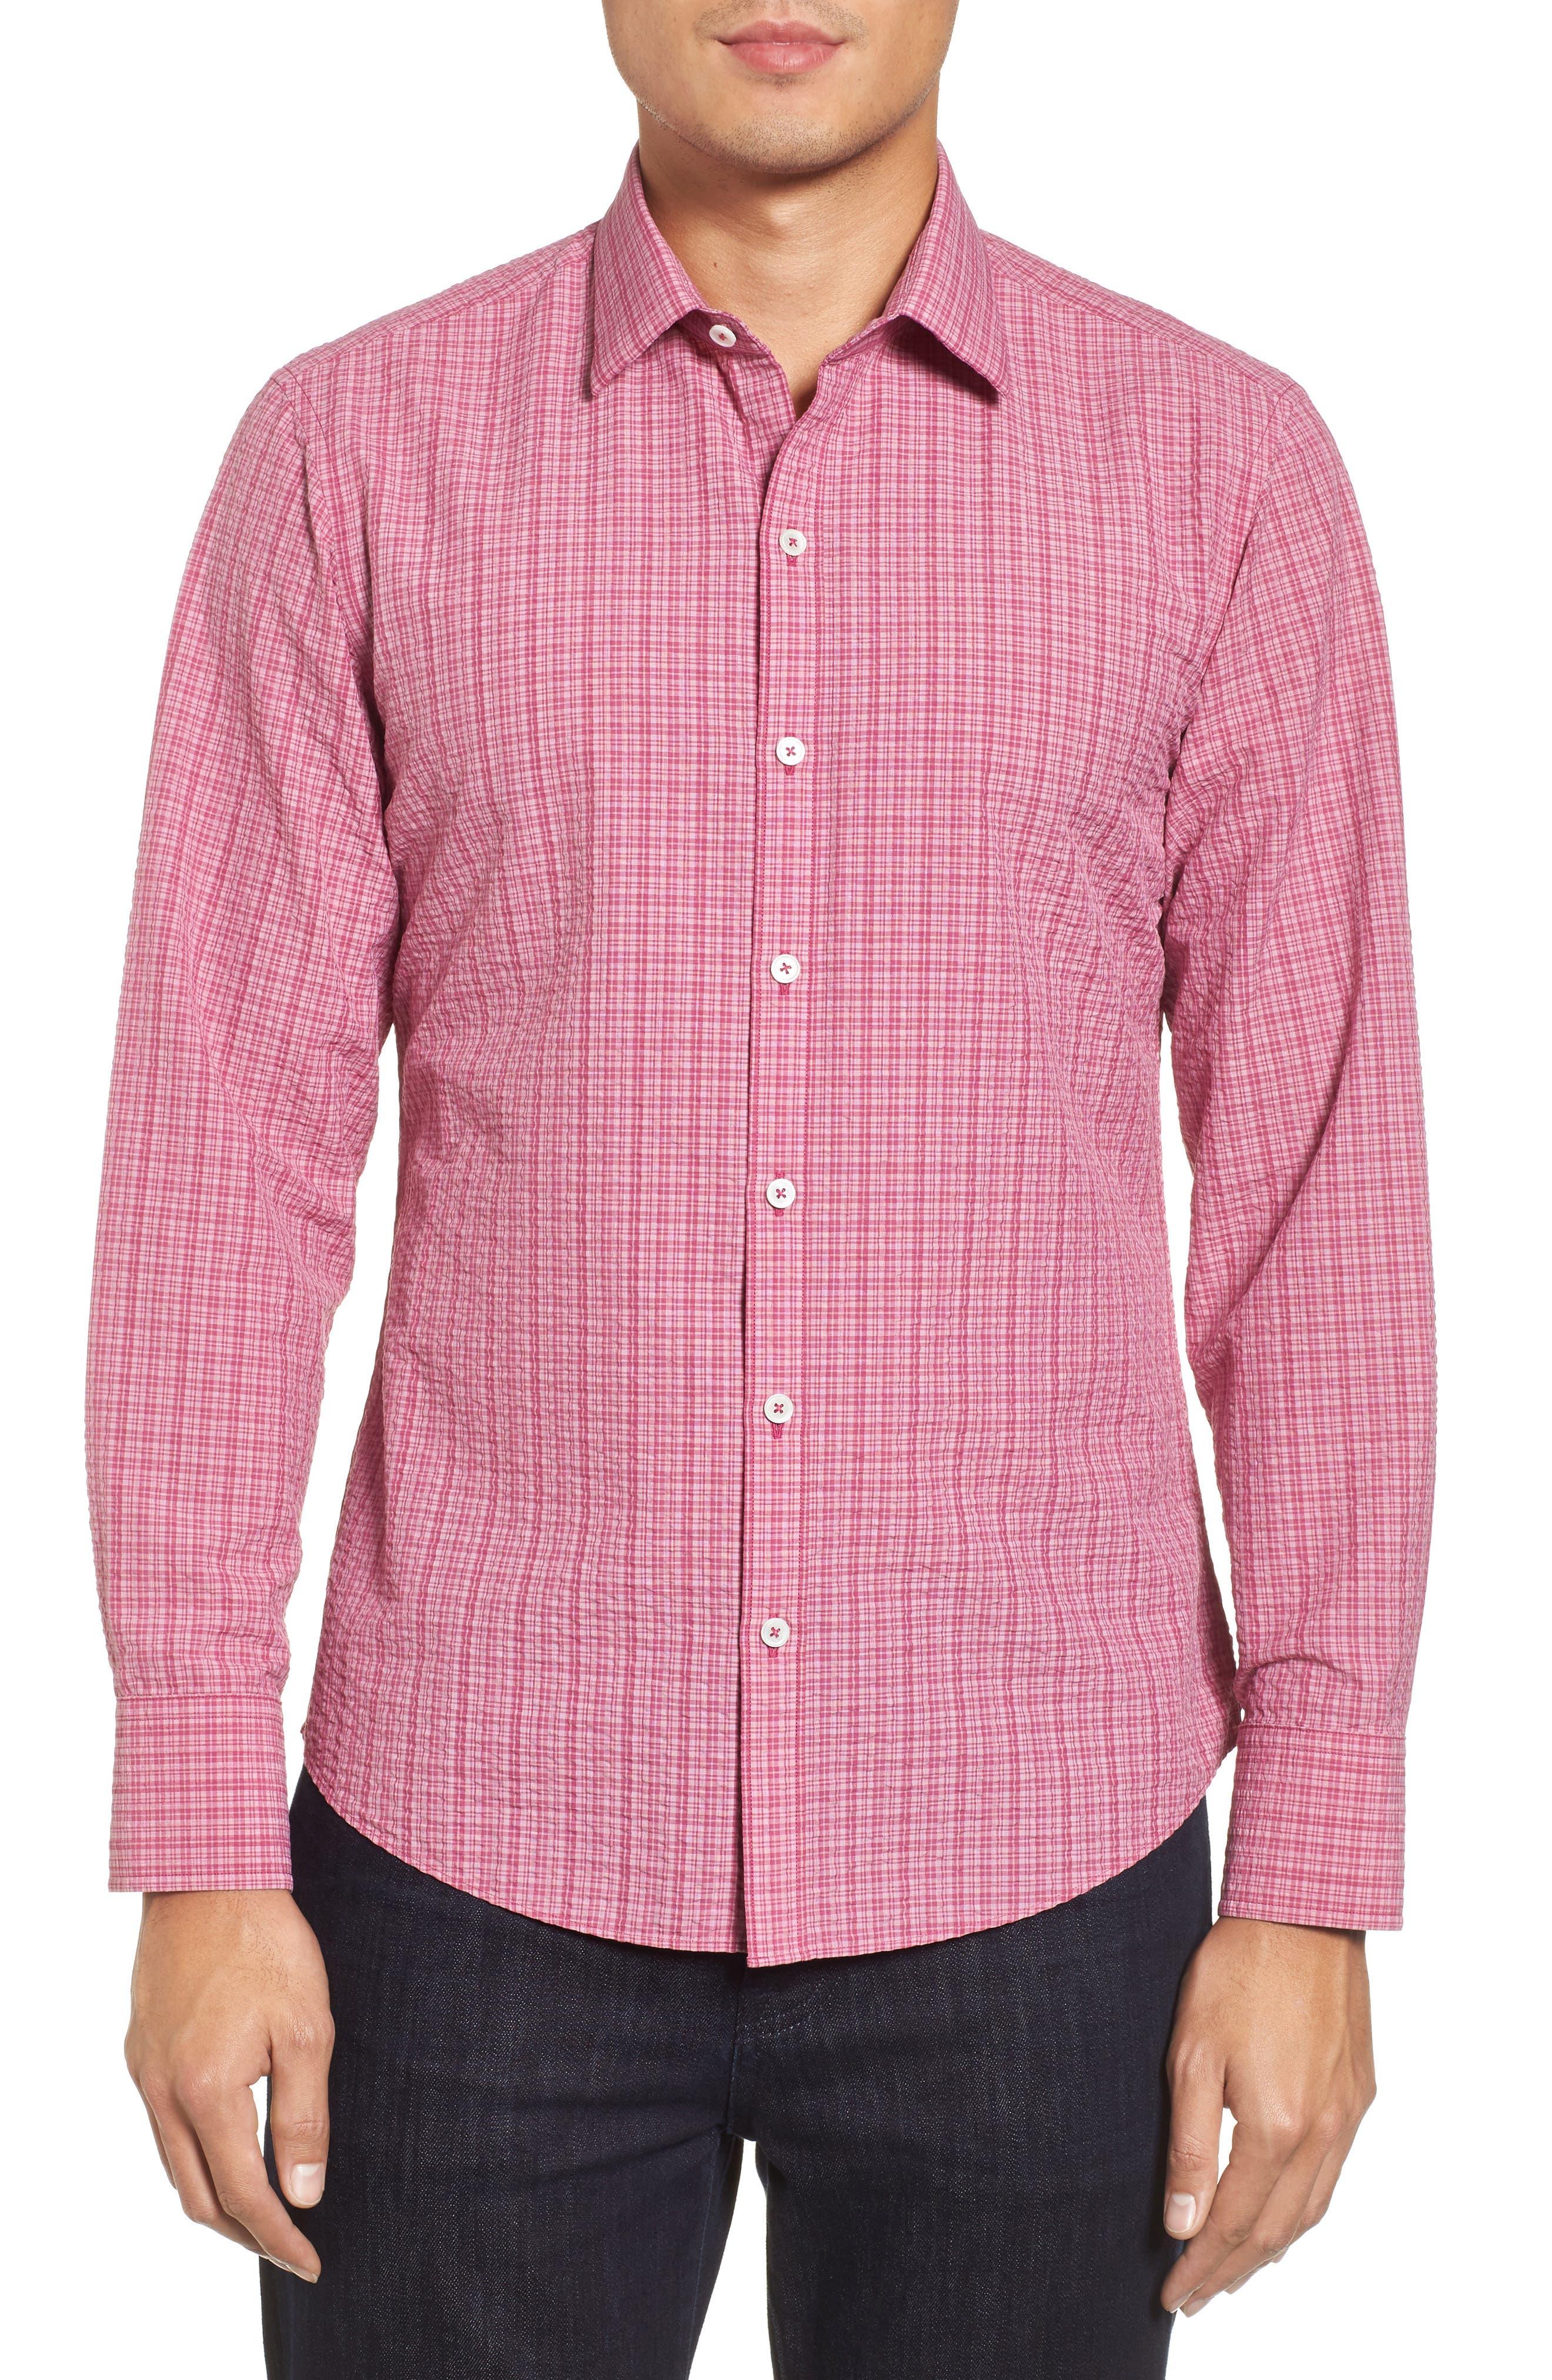 Italo Seersucker Woven Sport Shirt,                             Main thumbnail 1, color,                             Dark Pink